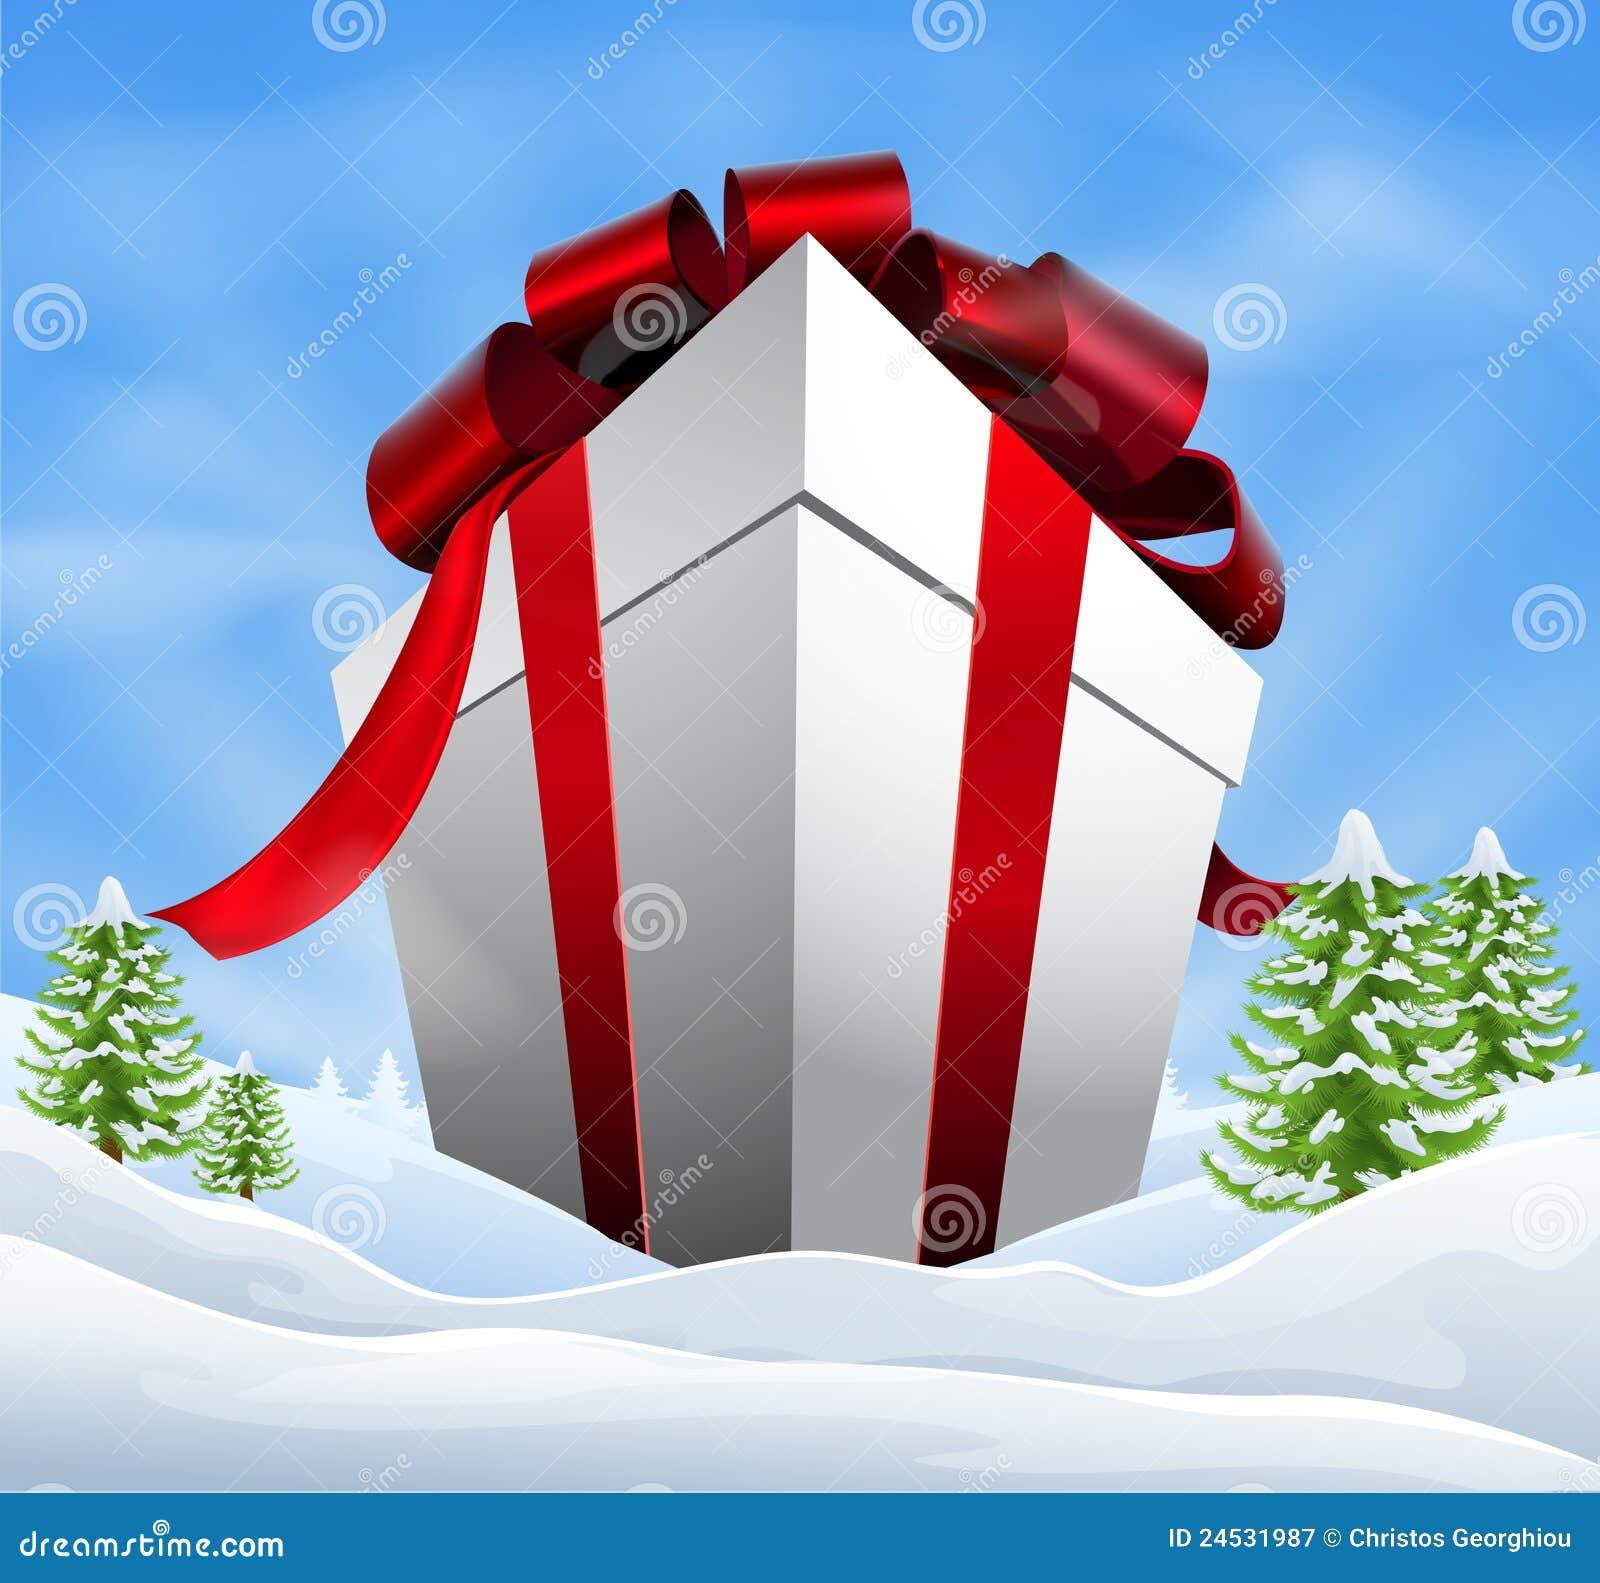 giant christmas gift royalty free stock photography